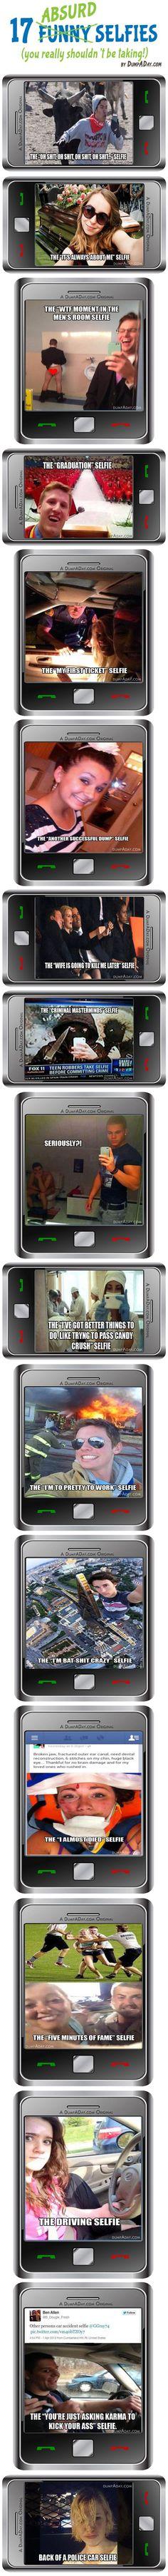 99 Best Hahahahaha images